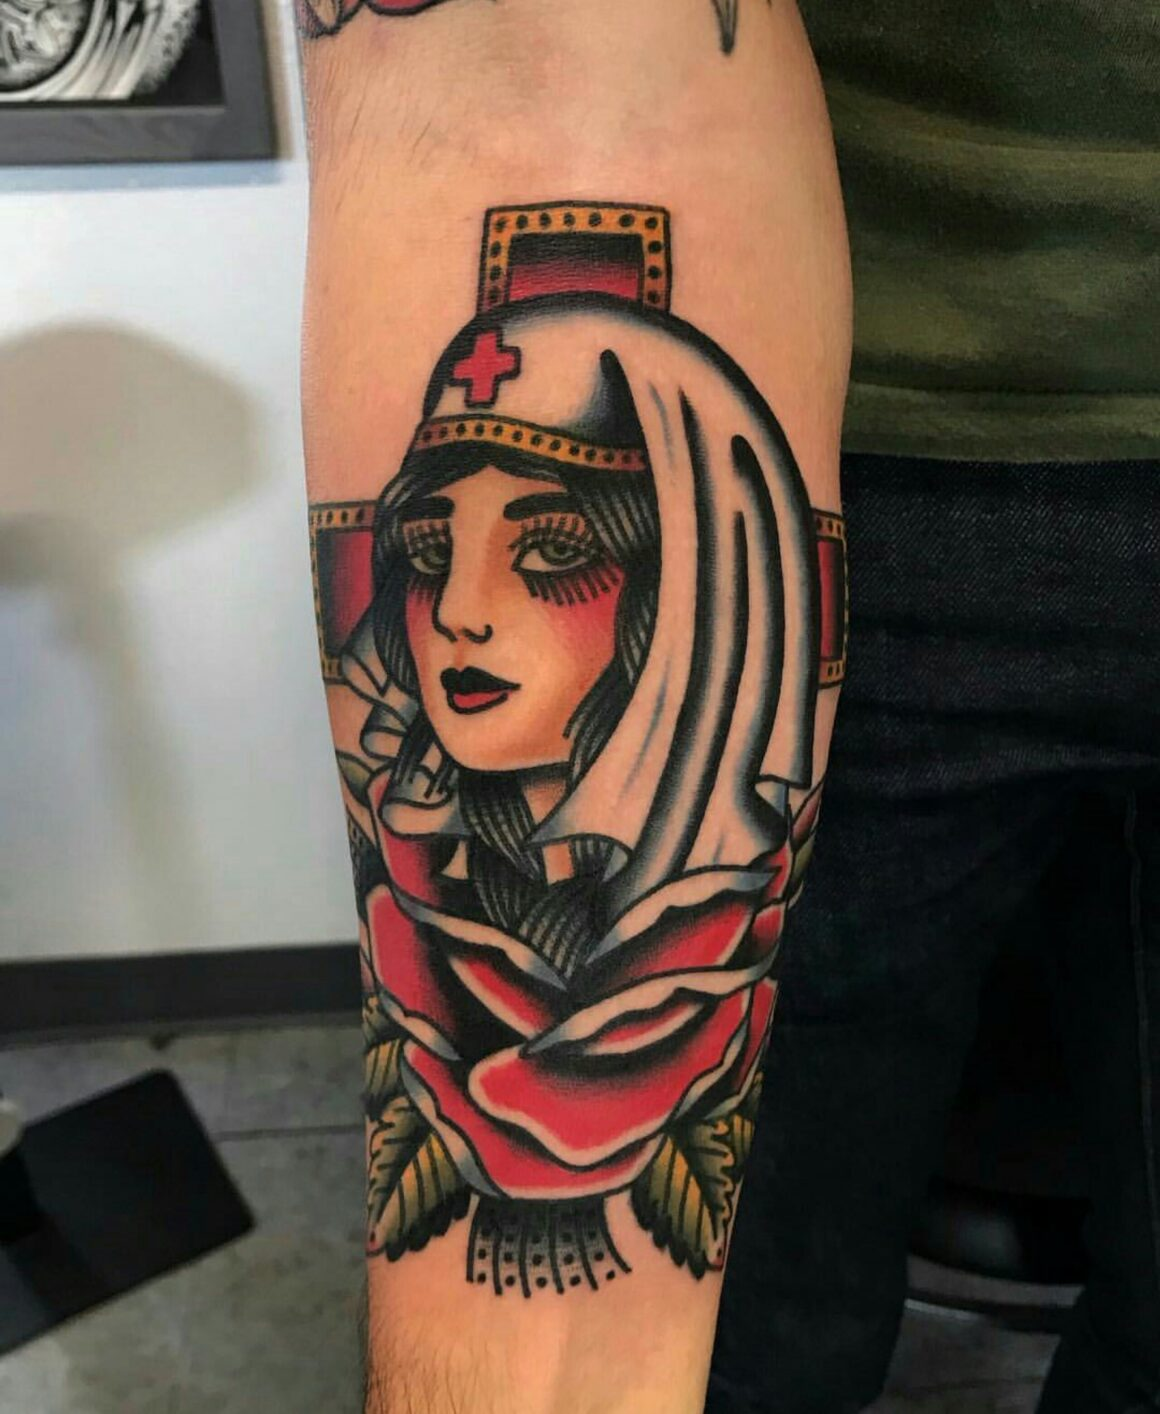 Nicholas, Visible Ink Tattoo, Malden, USA